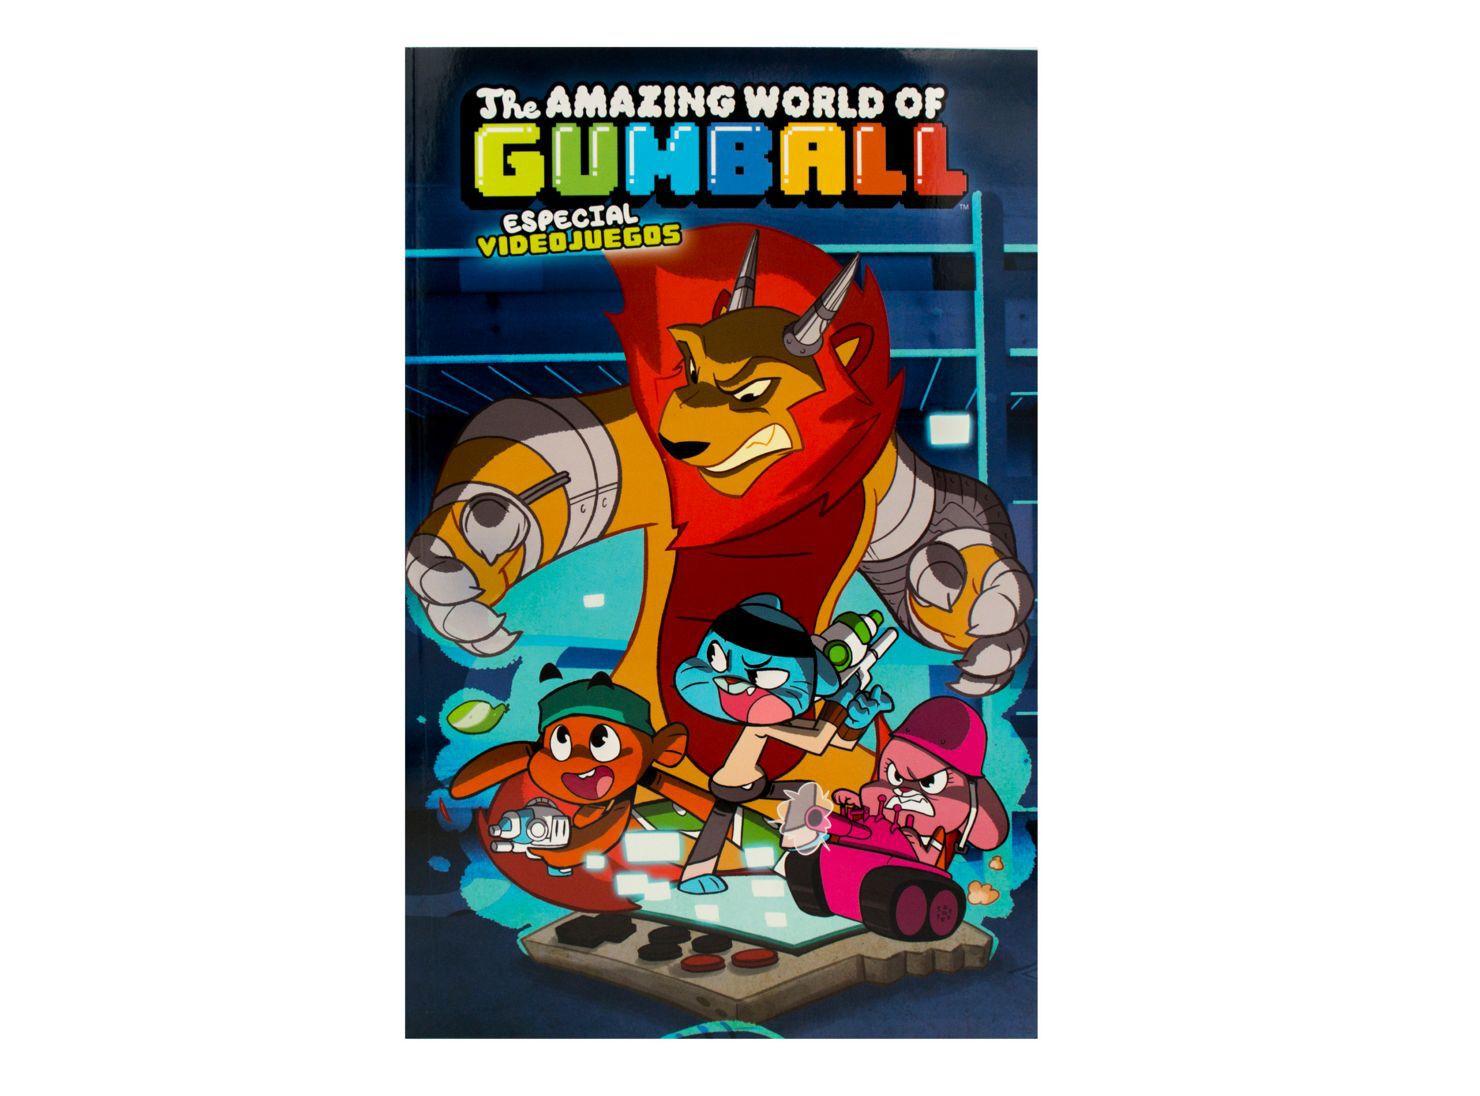 97cbcad0 Comics Norma El Asombroso Mundo De Gumball 4 Especial Video Juegos ...